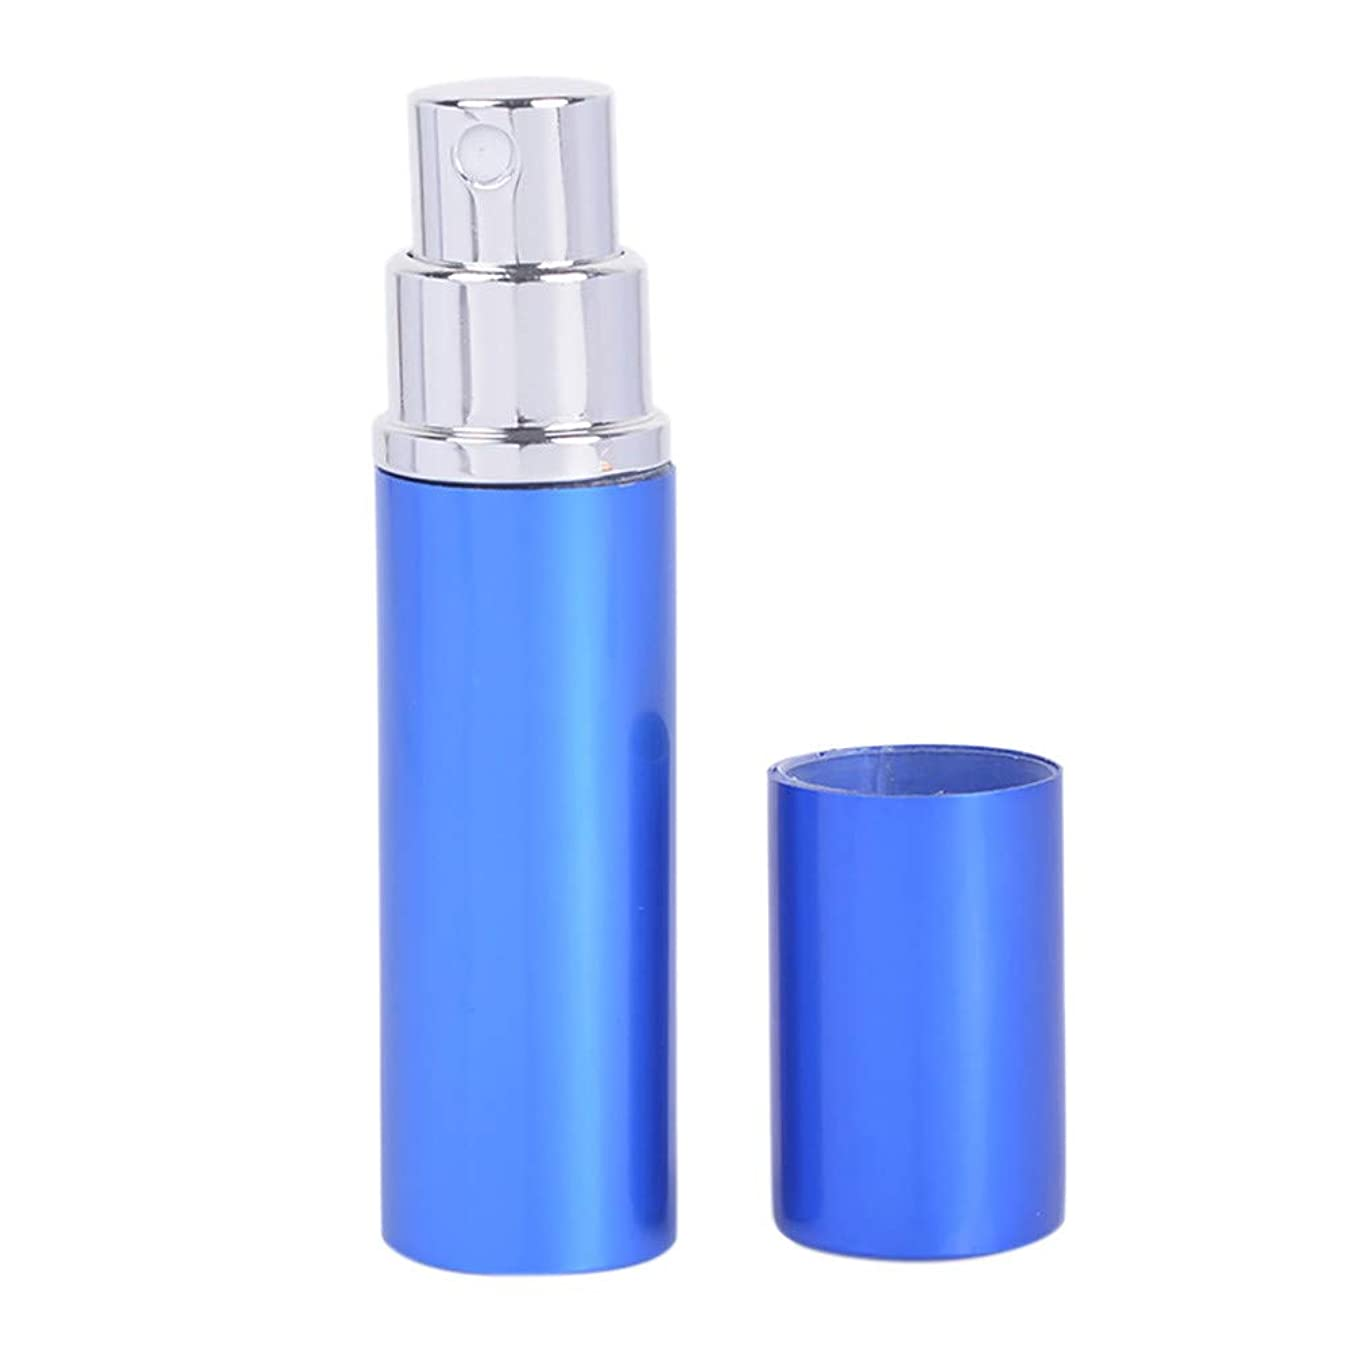 CGKUITER 1 Pack - 5 Milliliter Mini Refillable Perfume Atomizer Bottle, Refillable Perfume Spray, Scent Pump Case, Perfume Atomizer Refillable Travel, Multicolor s9930665468